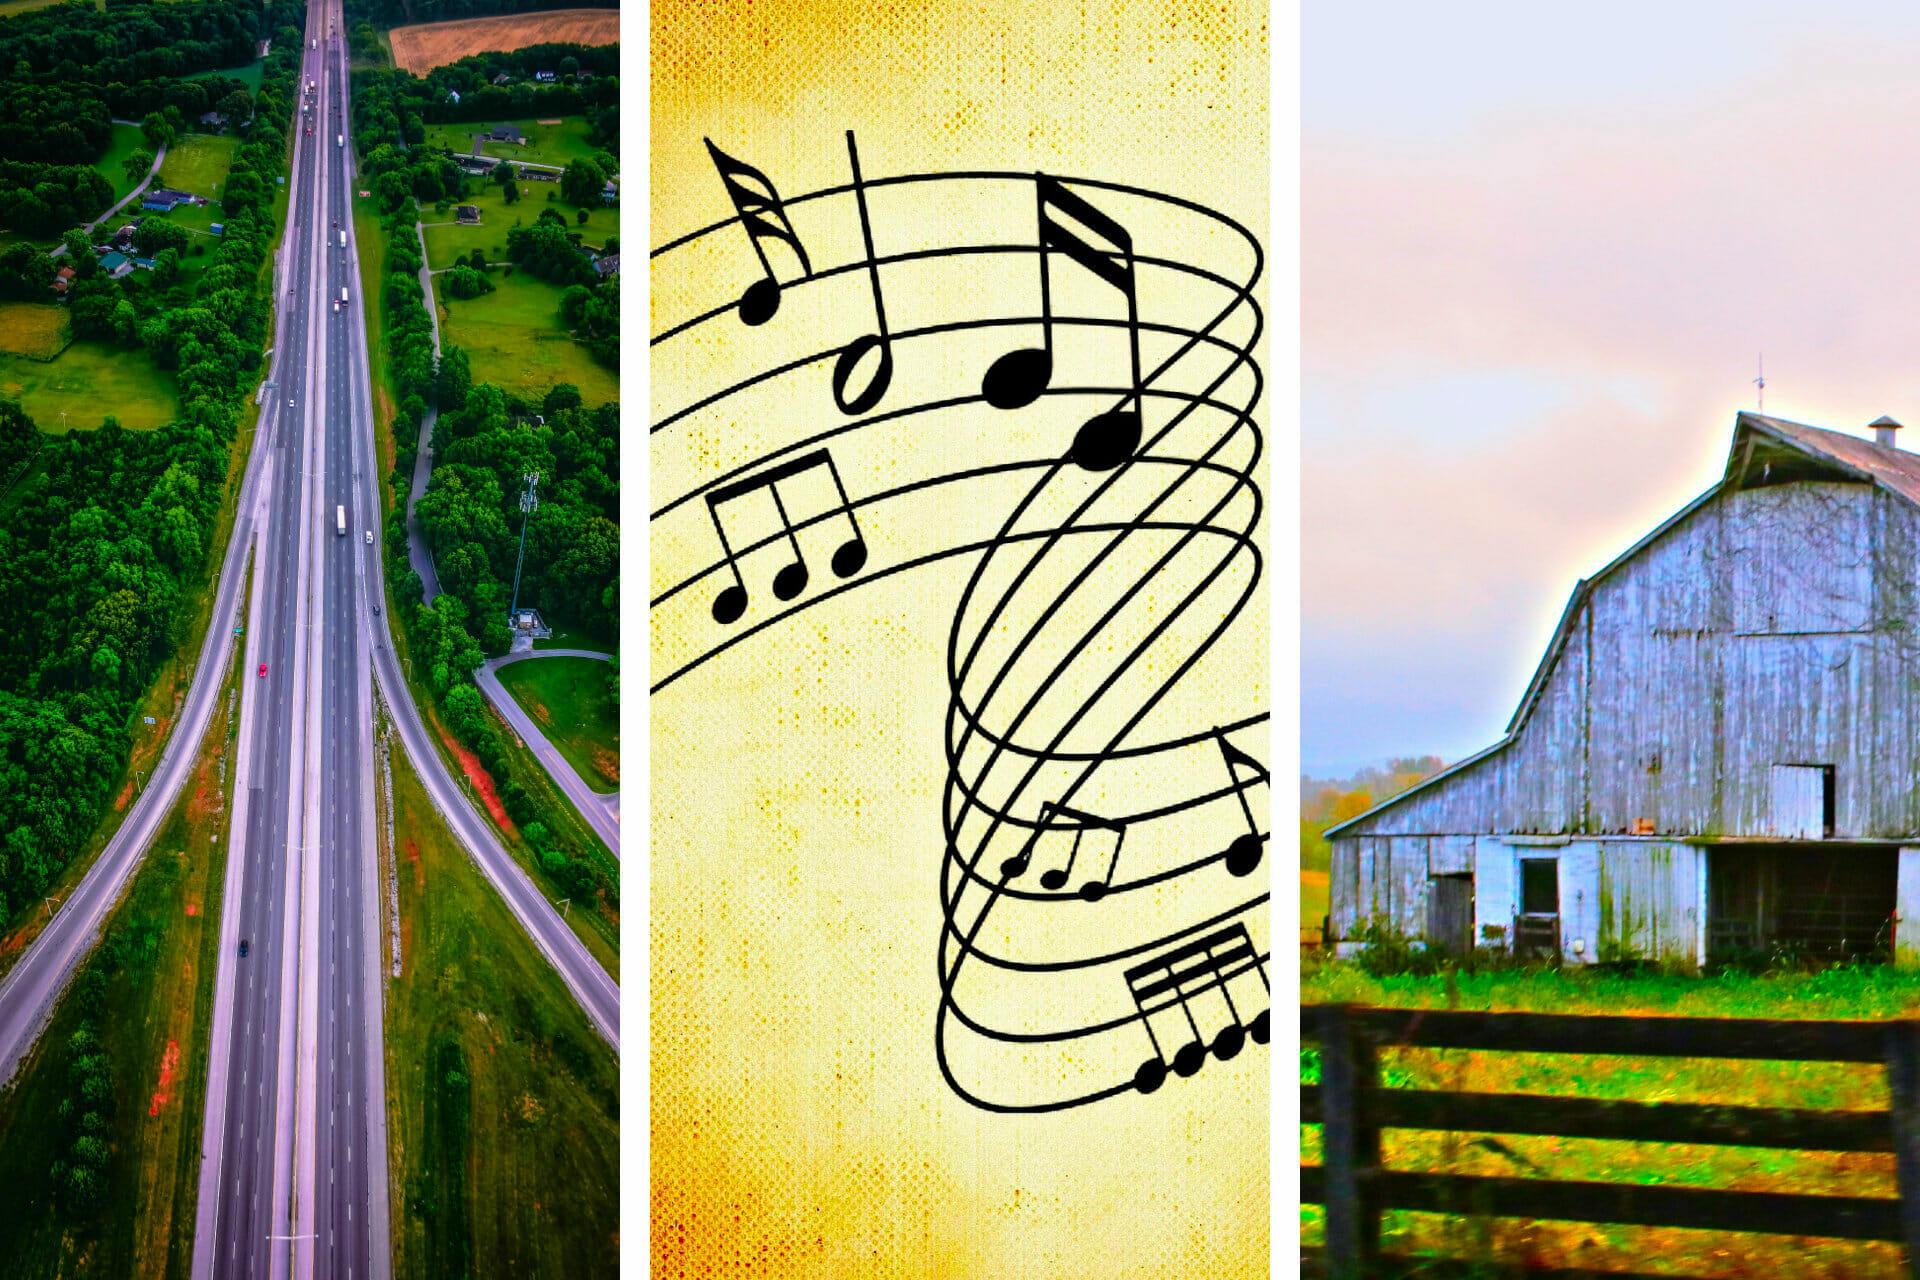 24+ Songs about Kentucky to Make You Feel at Home via @allamericanatlas